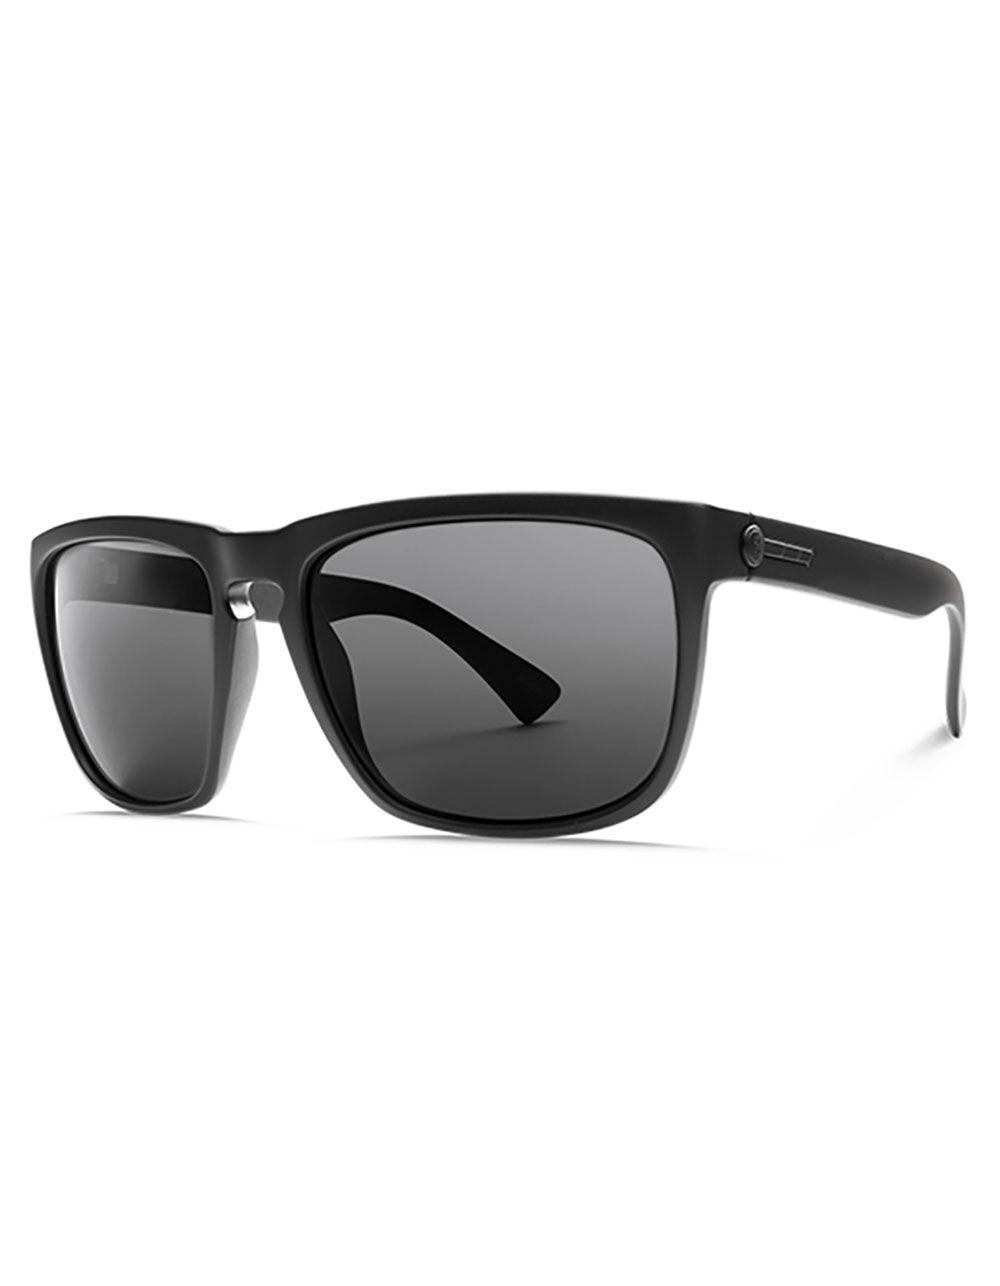 ELECTRIC Knoxville XL Polarized Matte Black Sunglasses